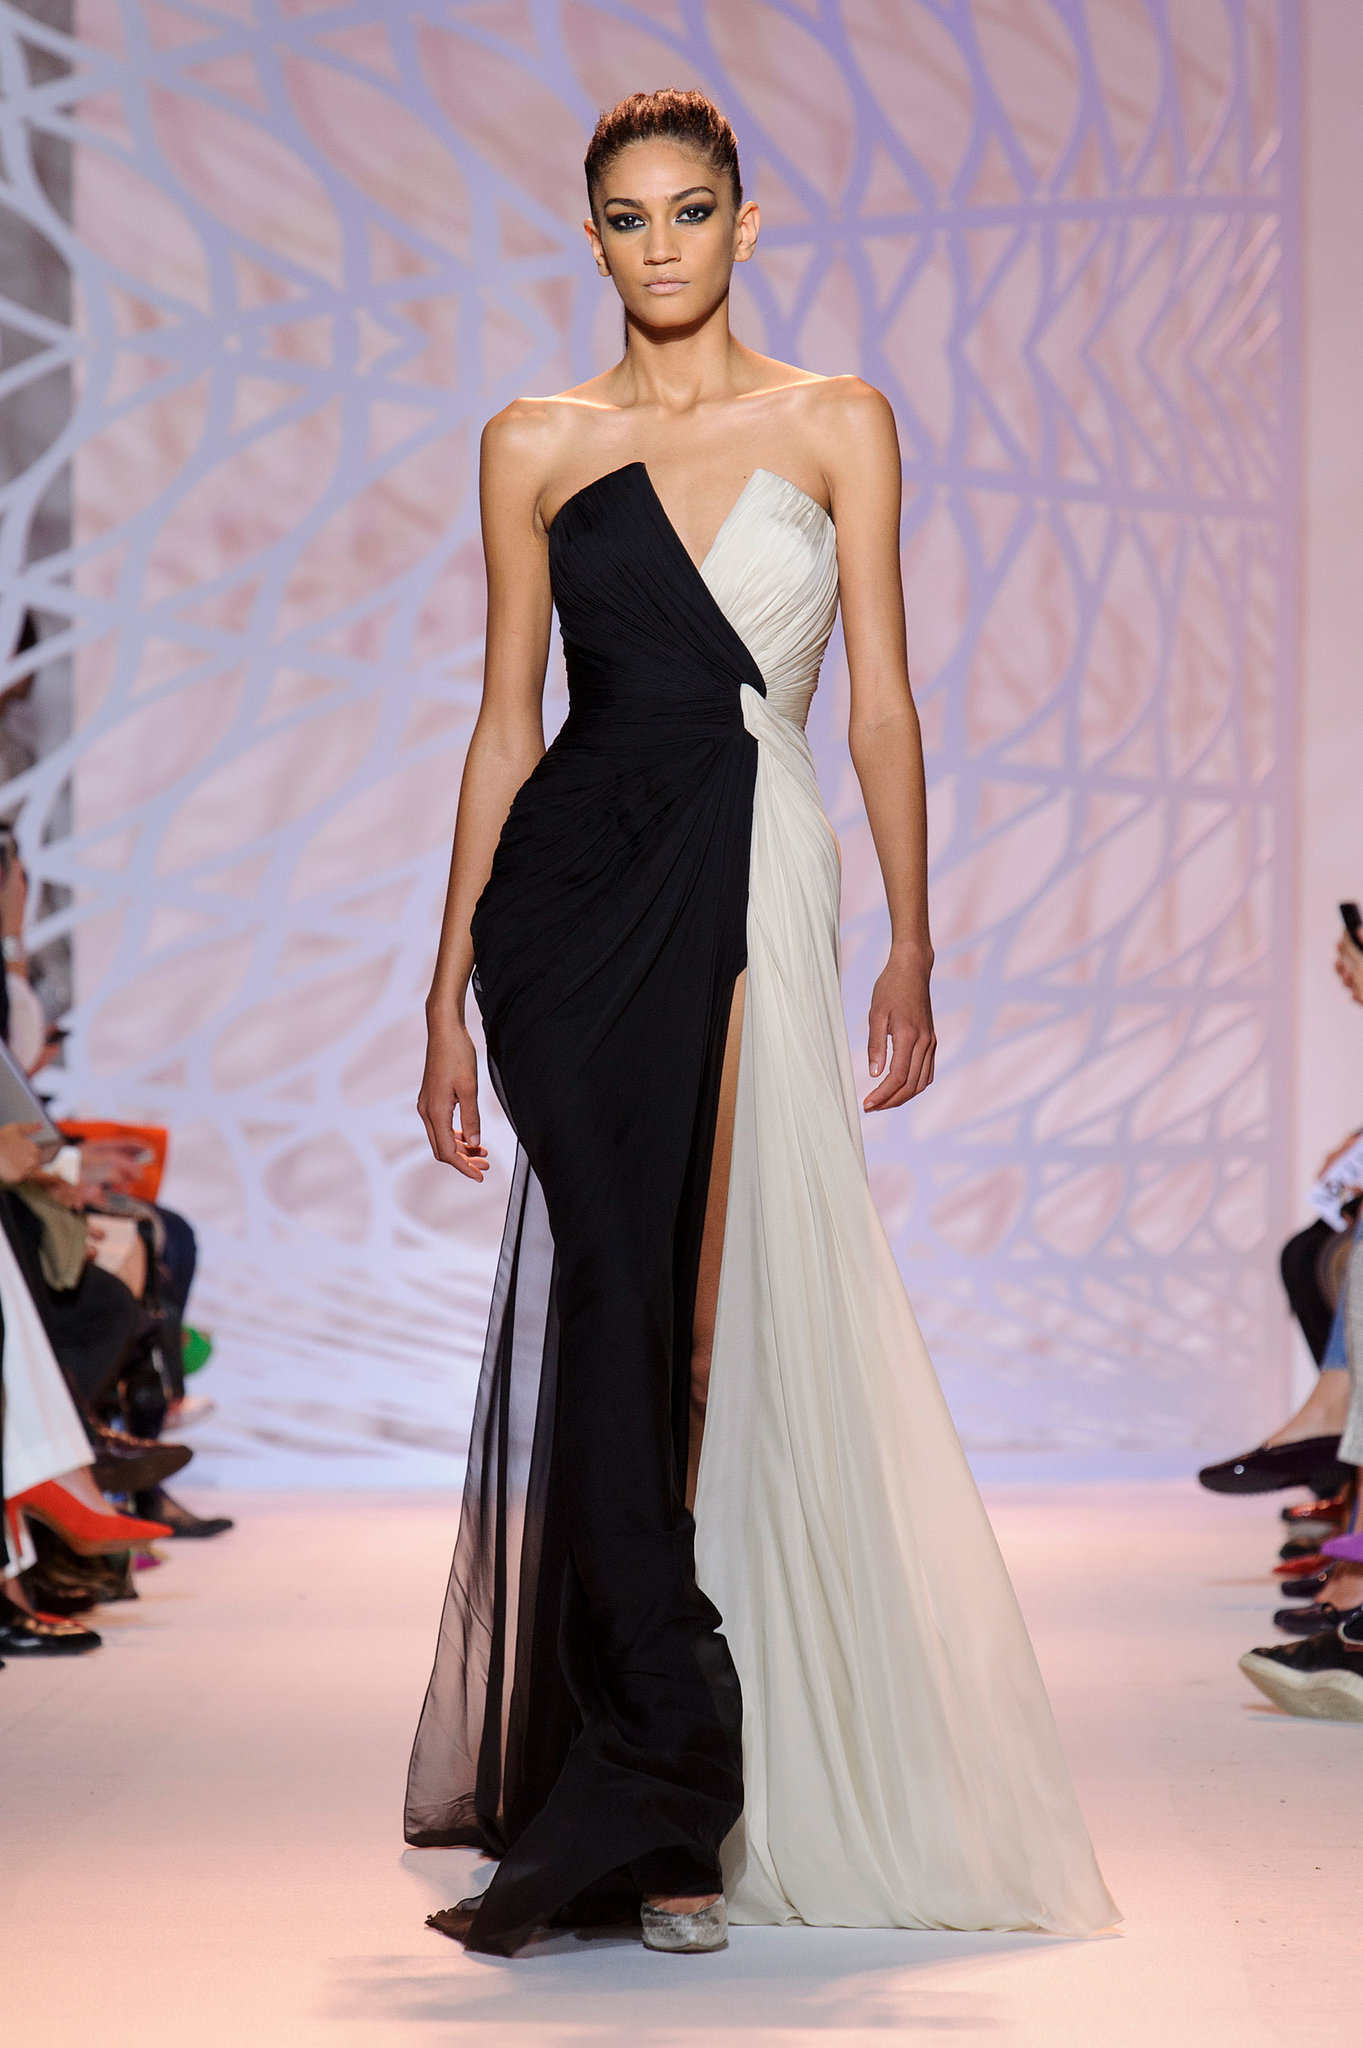 Zuhair Murad Haute Couture Fall 2014Zuhair Murad Haute Couture 2014